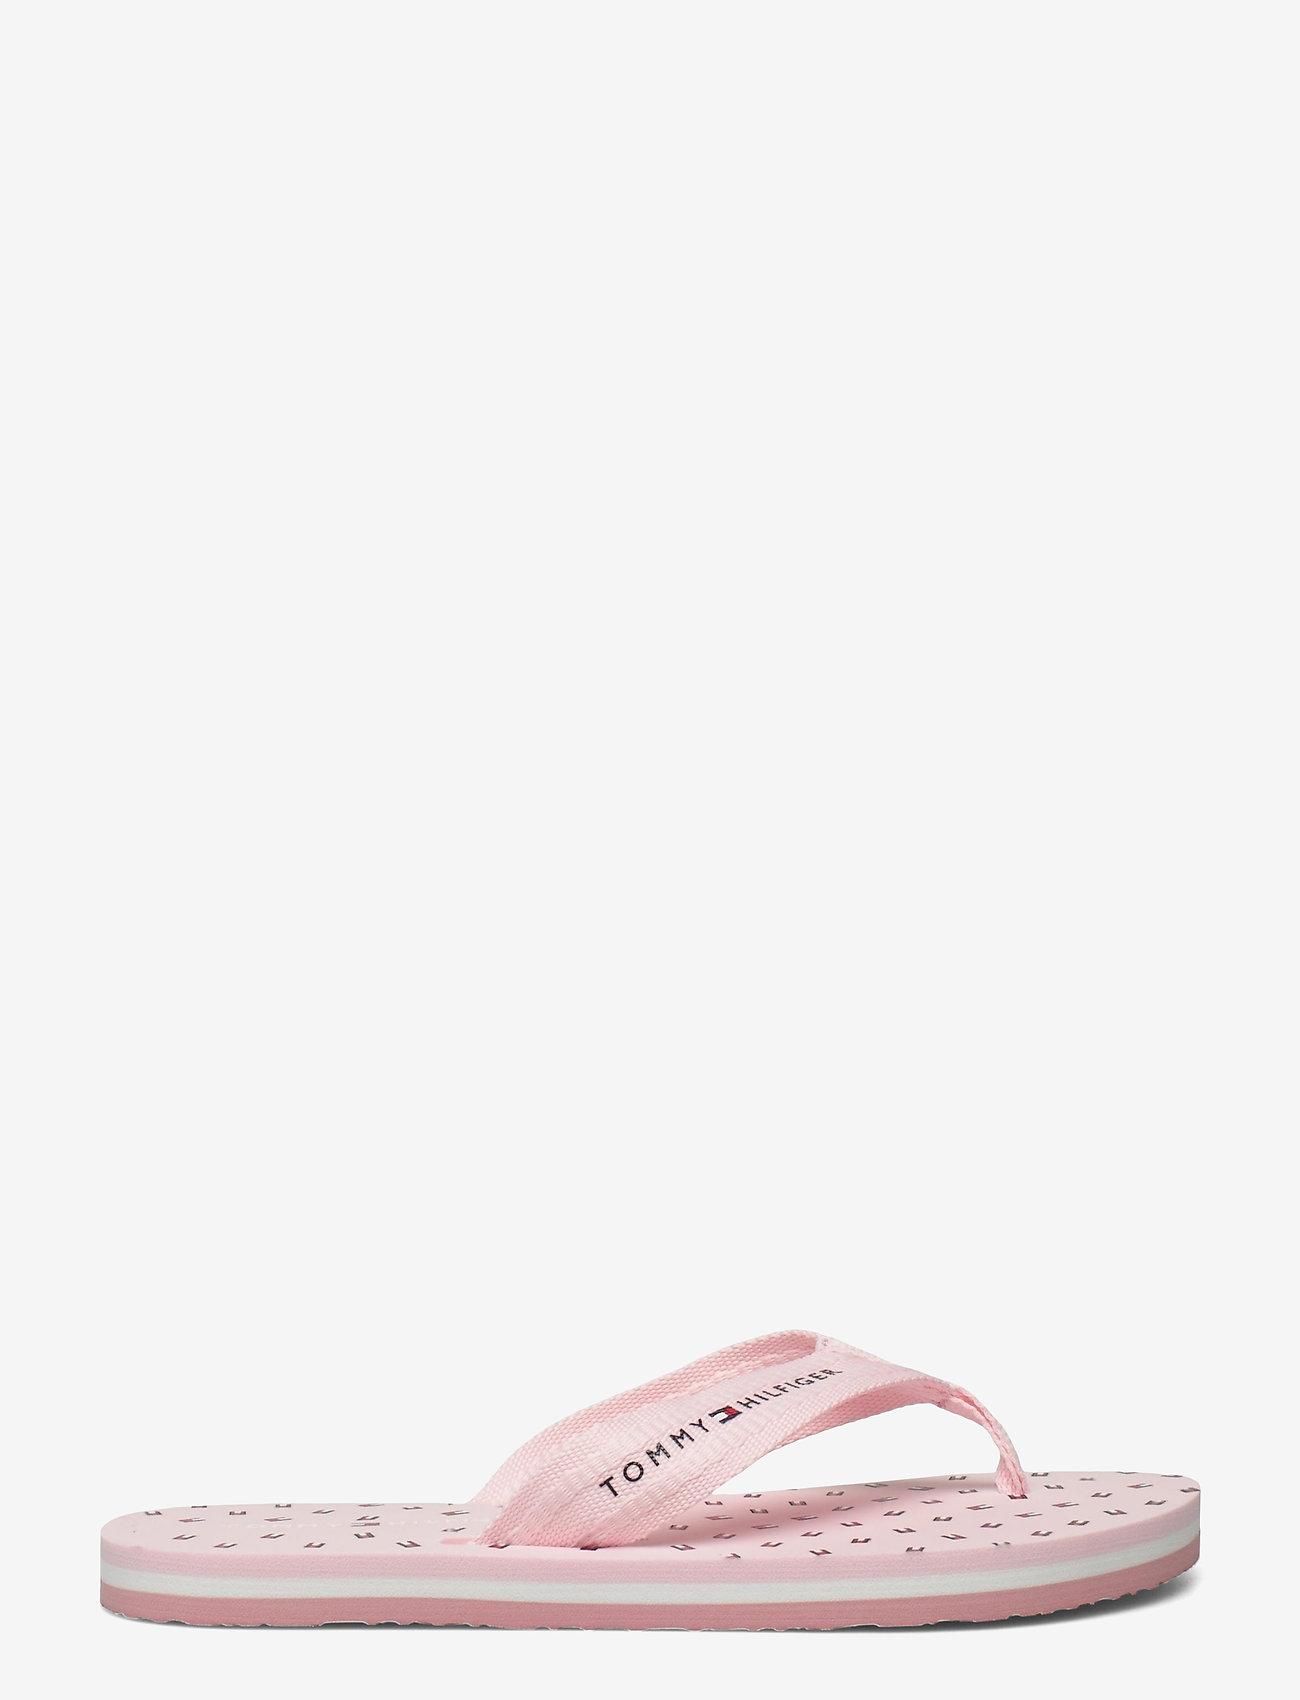 Tommy Hilfiger - TH MINI FLAGS BEACH SANDAL - flat sandals - light pink - 1